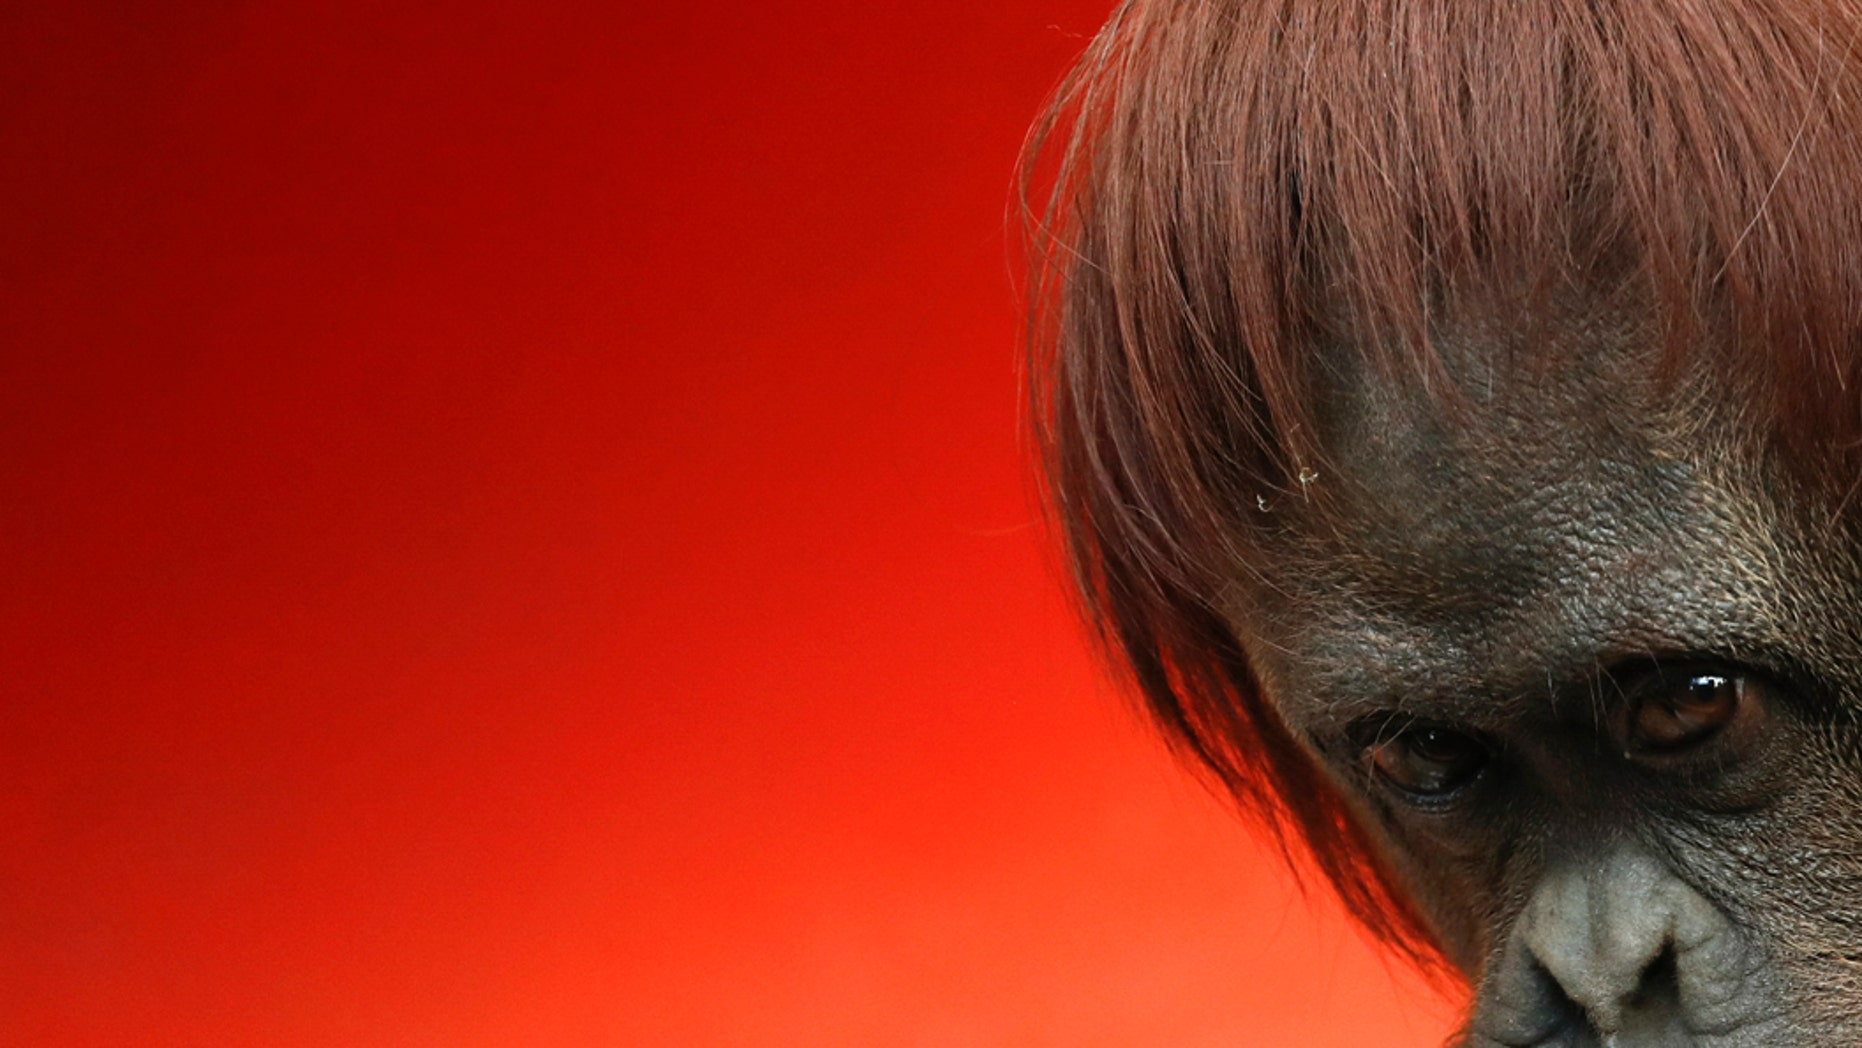 Westlake Legal Group sandra-the-orangutan Argentine orangutan Sandra to head to US great ape sanctuary fox-news/science/wild-nature/mammals fnc/science fnc ed5b1643-1e93-5de0-a6b5-5aa9bb96bd54 Associated Press article